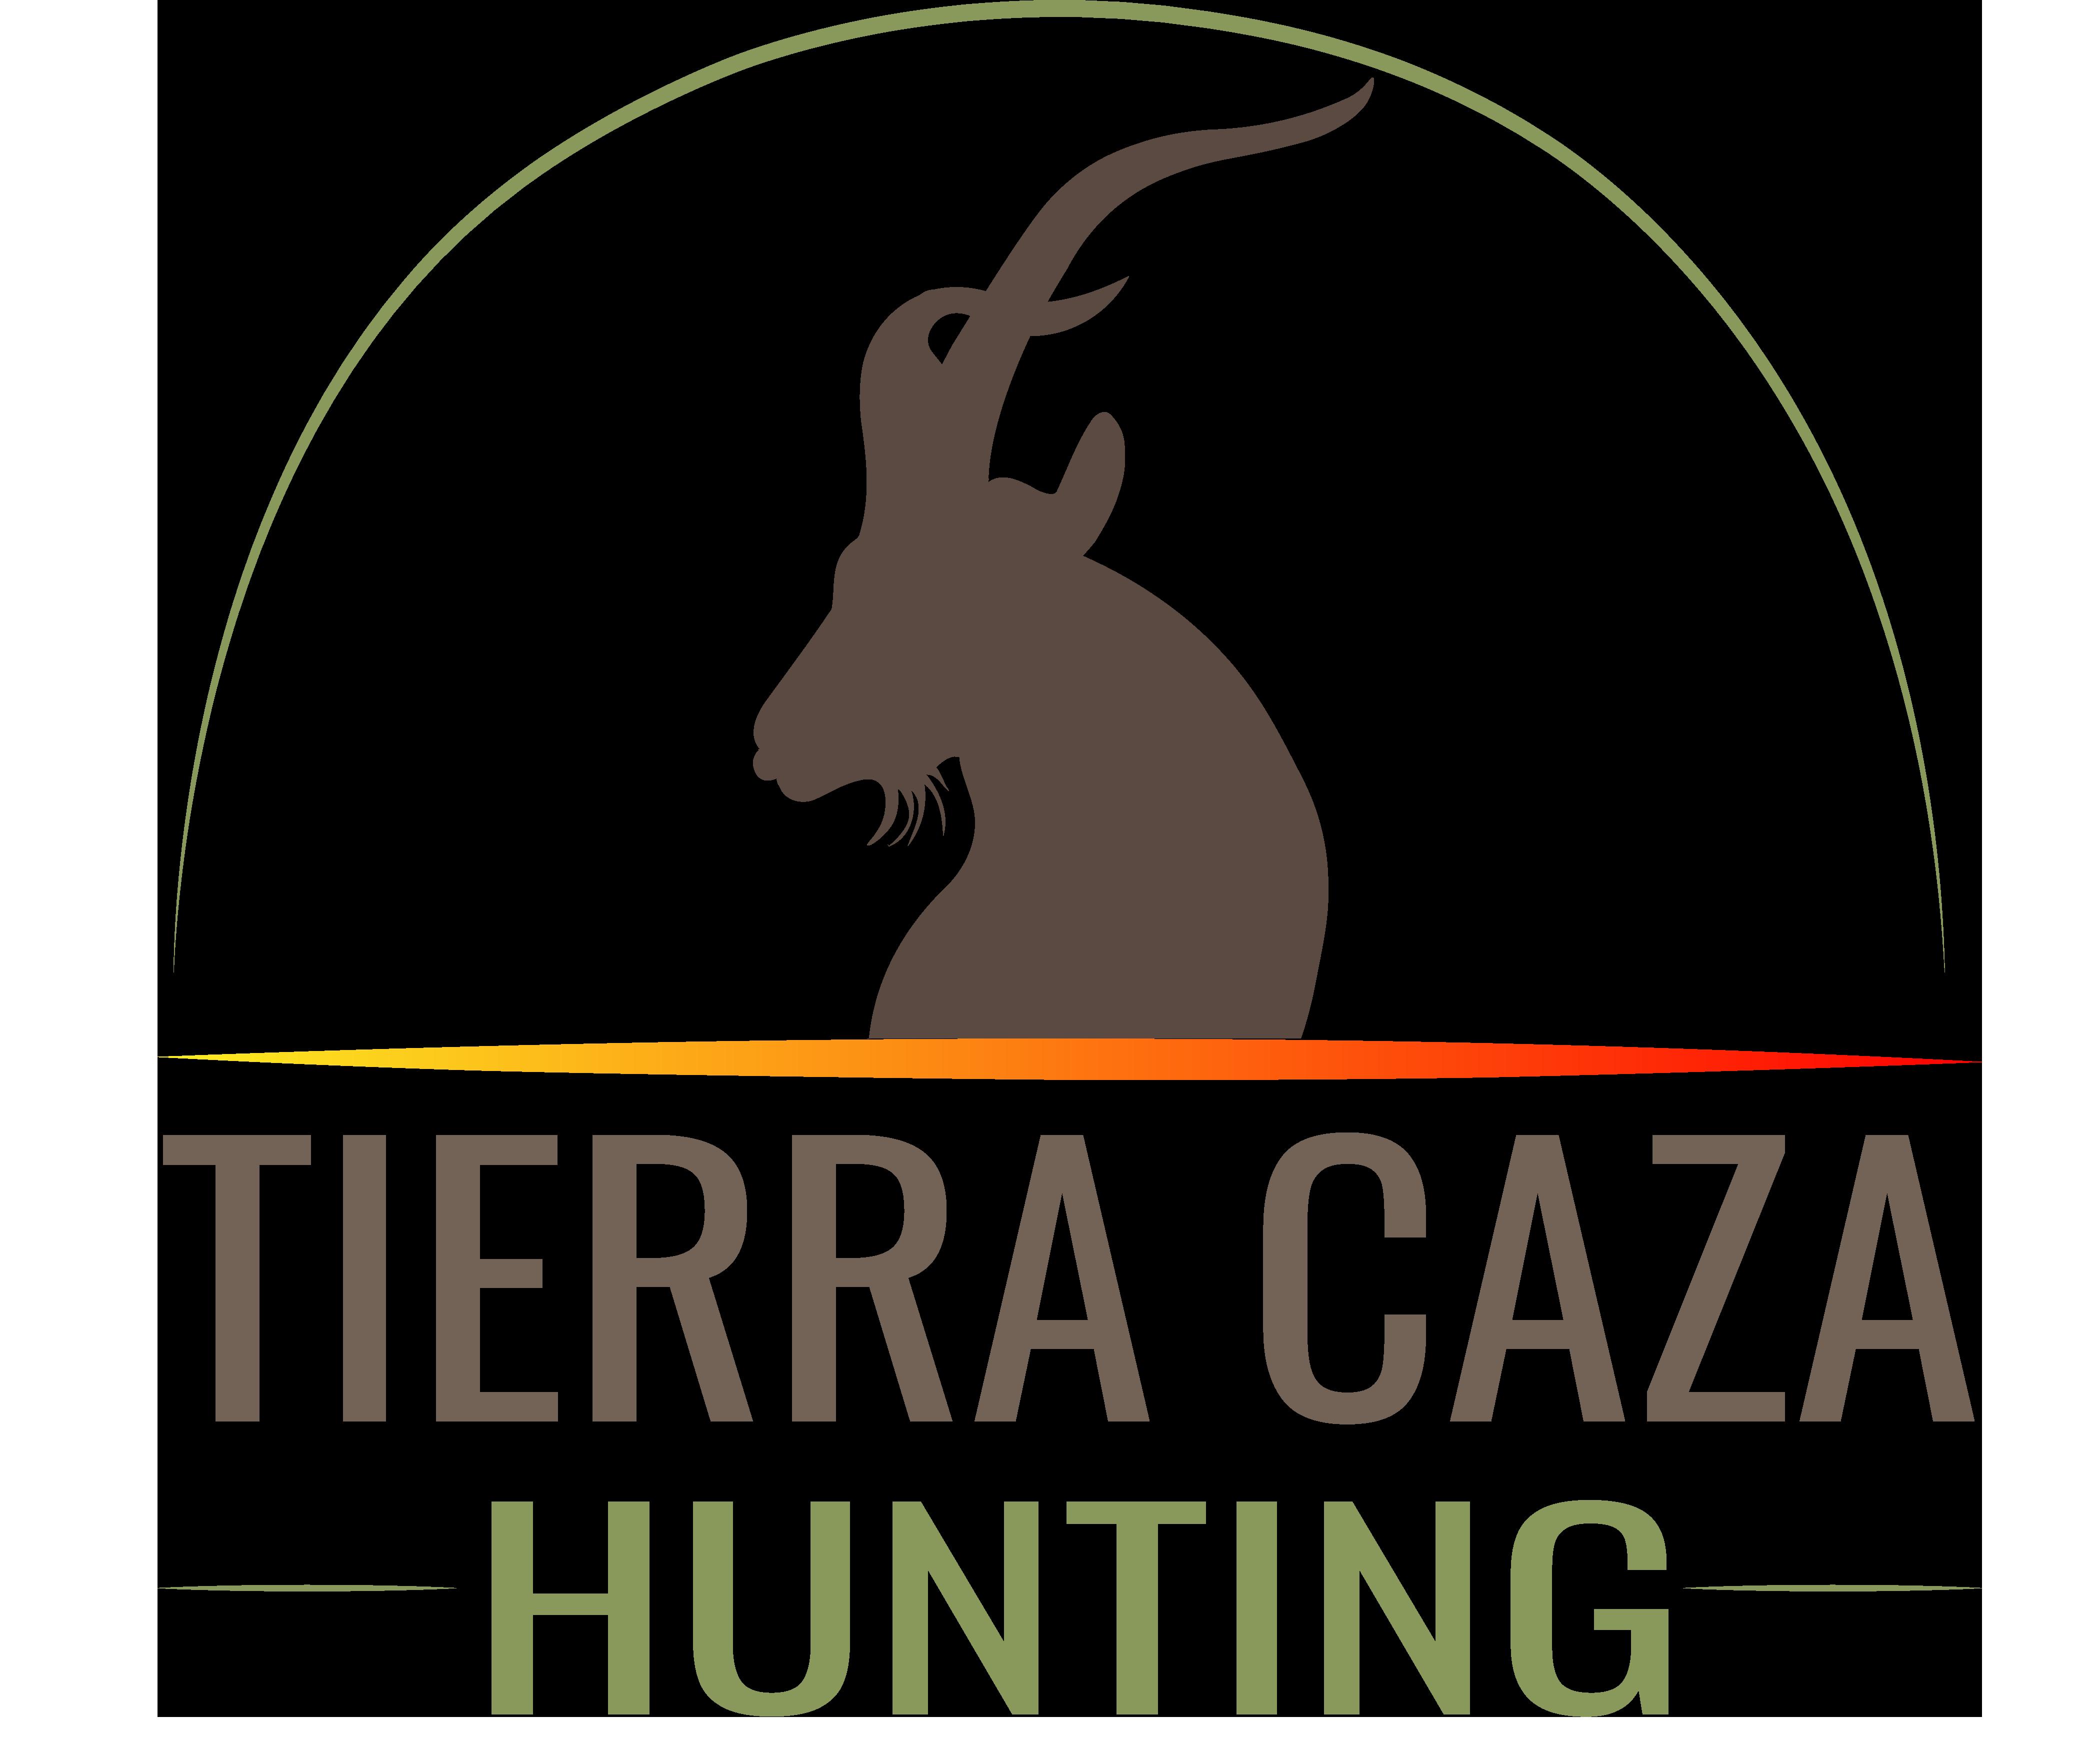 TierraCazaHunting